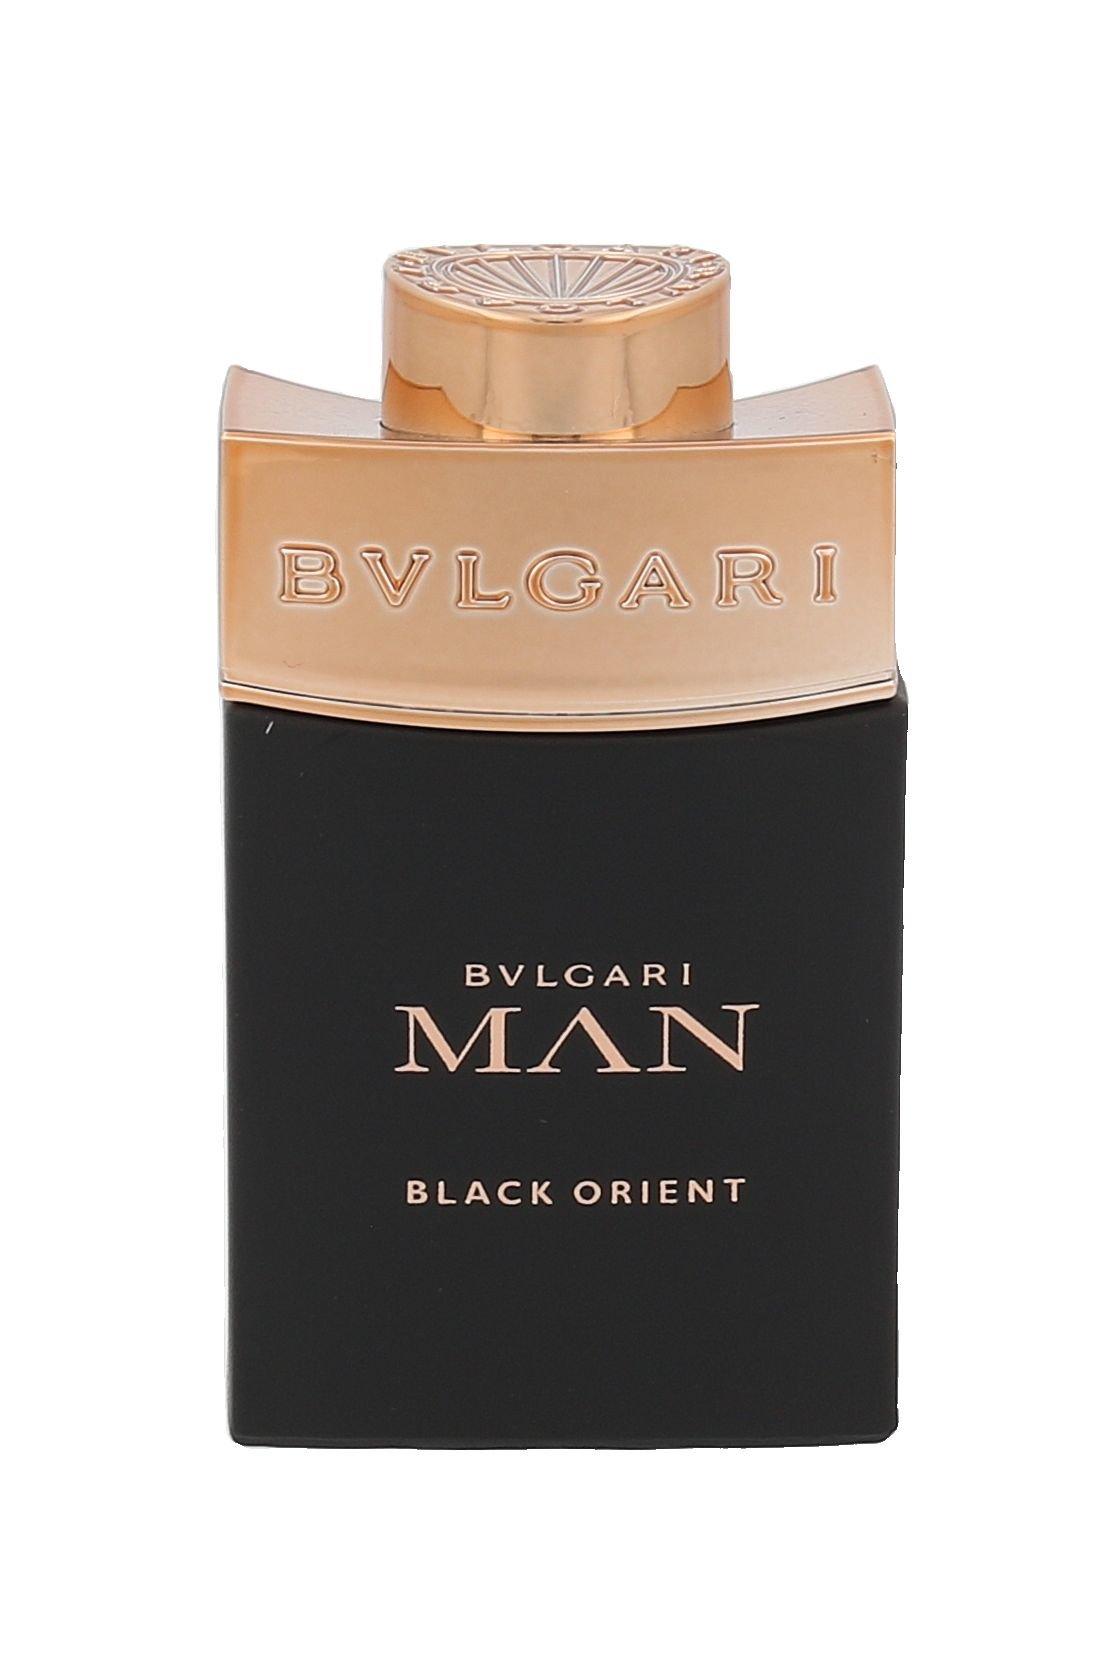 Bvlgari Man Black Orient Parfem 15ml